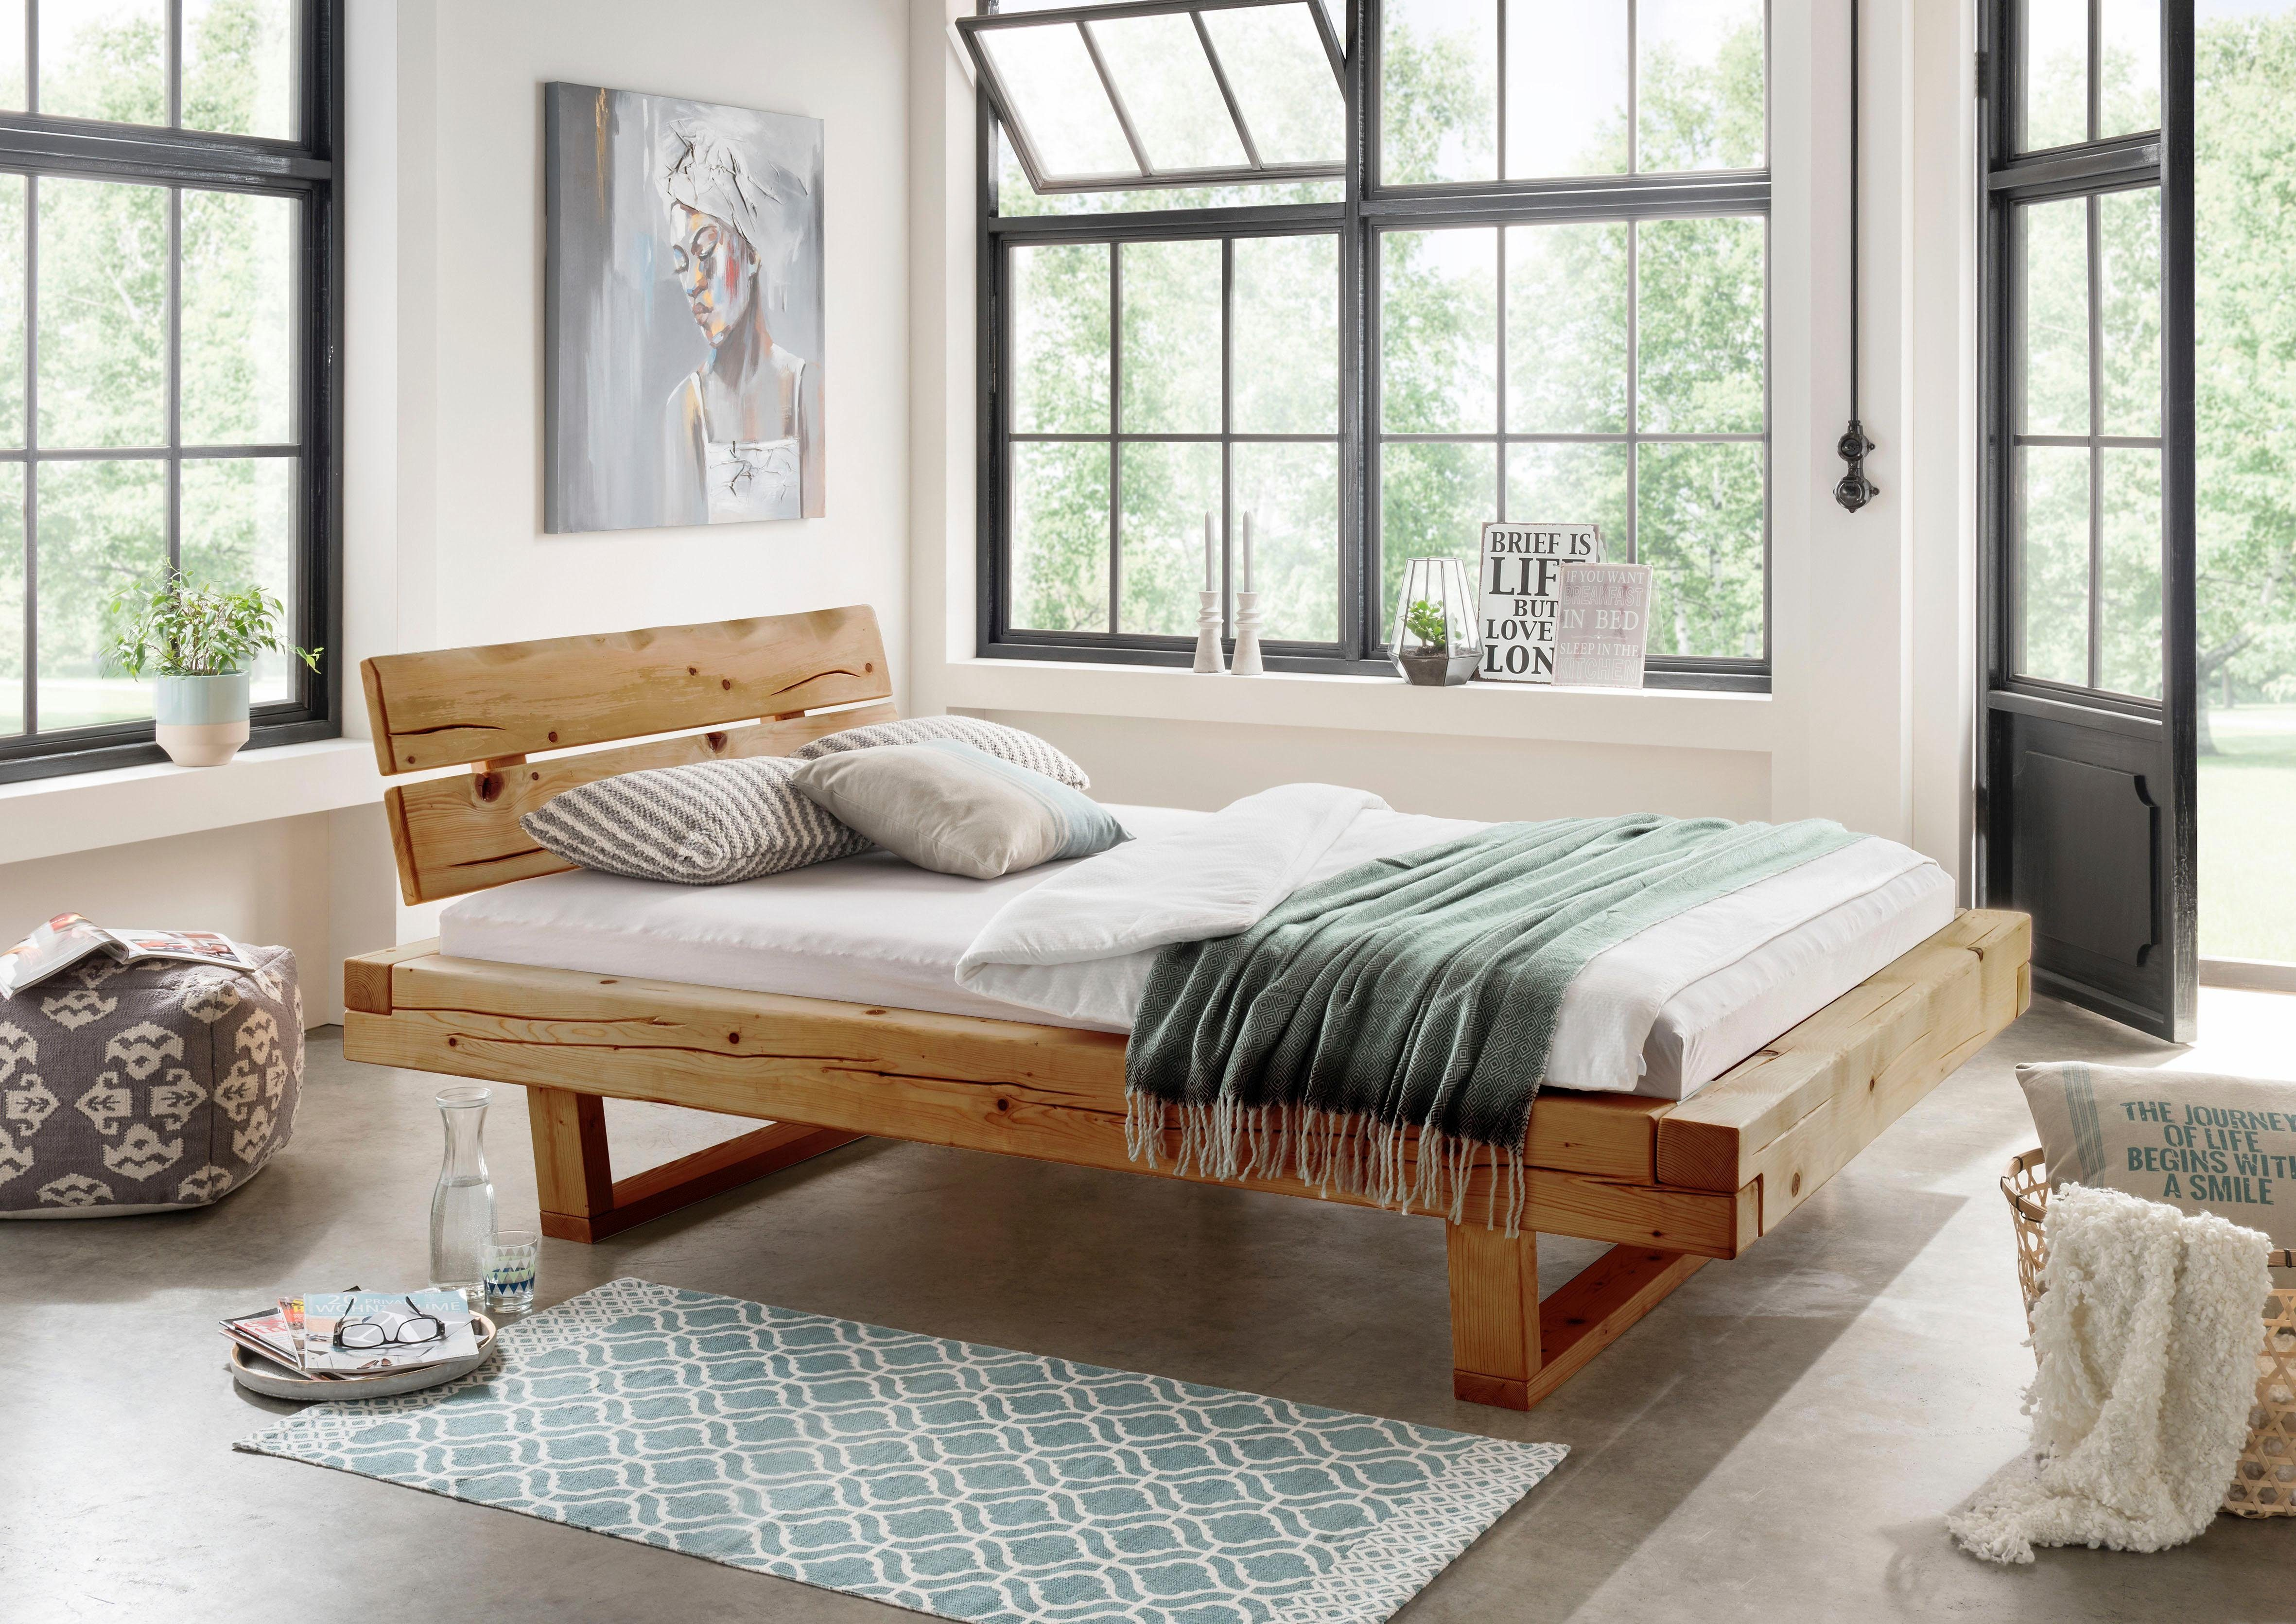 Slaapkamer Massief Hout : Premium collection by home affaire slaapkamerserie ultima«